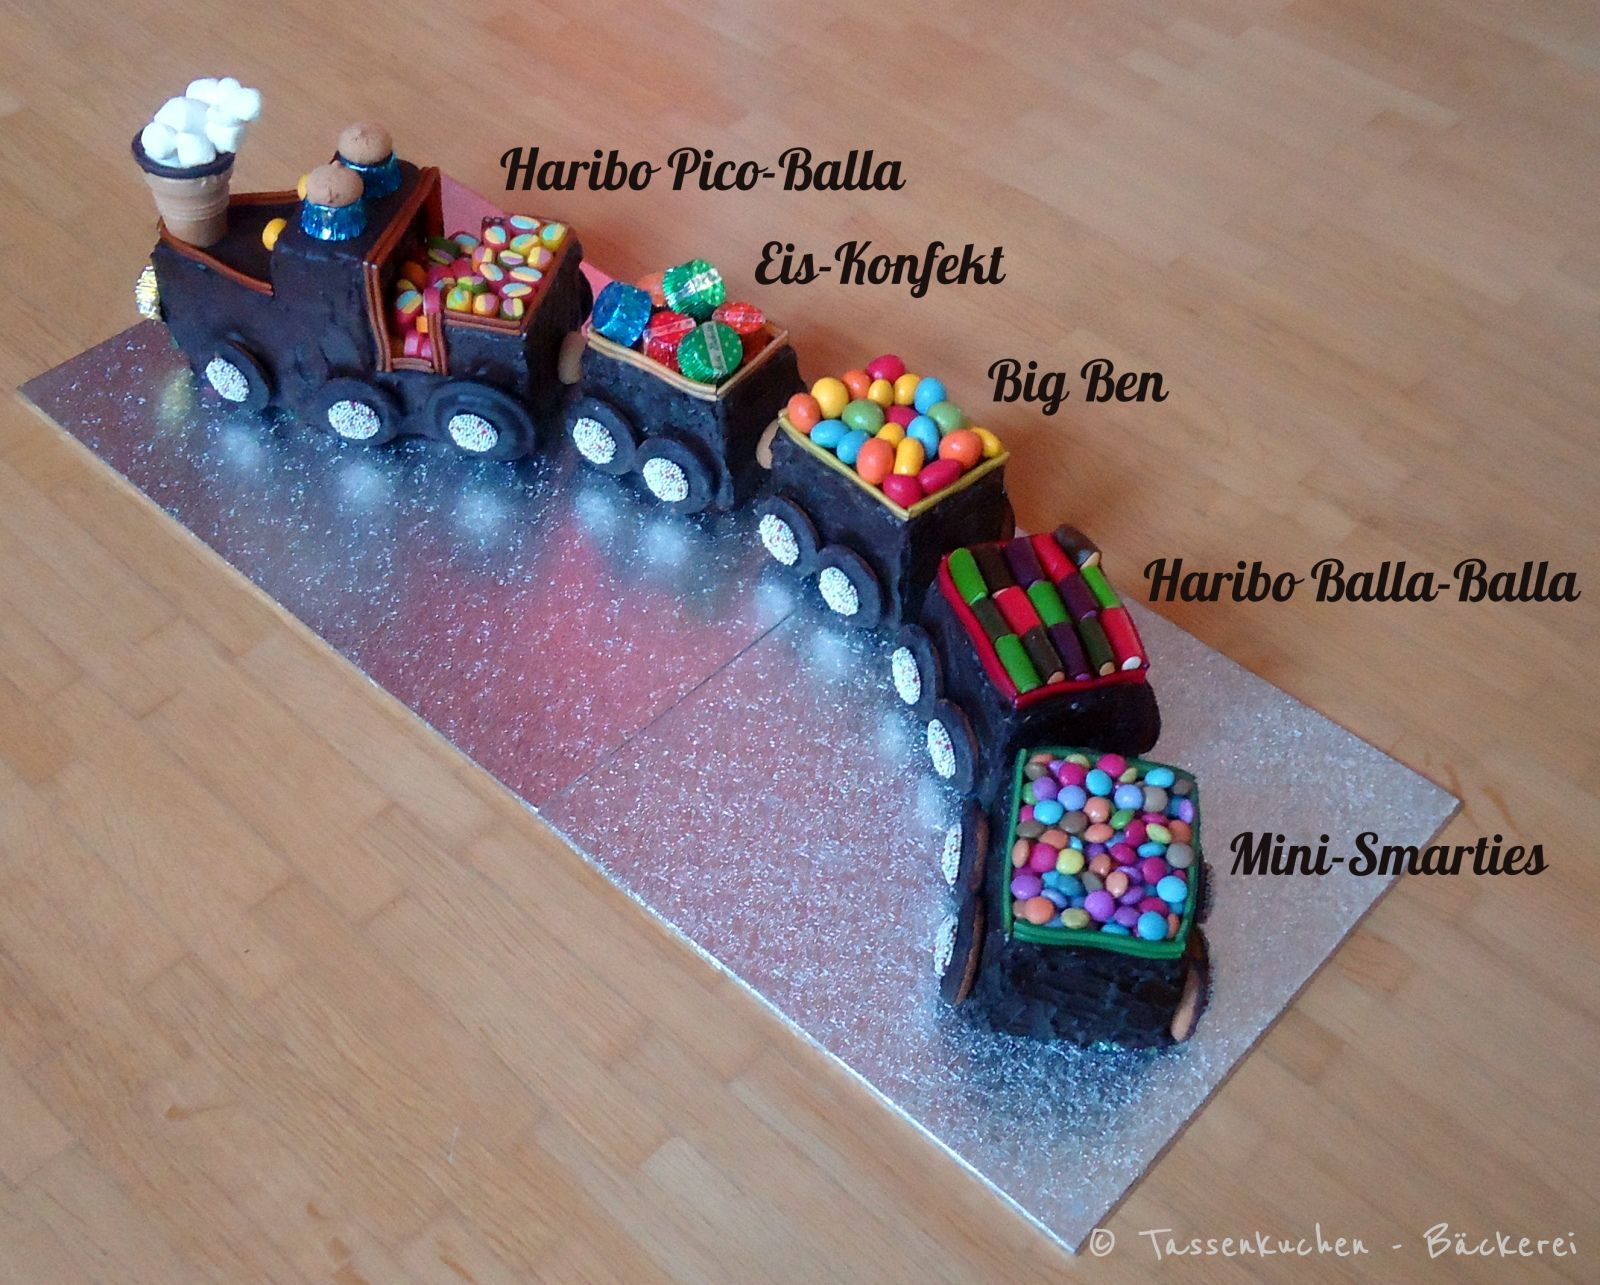 Tassenkuchen Backerei Eisenbahn Kuchen Cake Inspirations